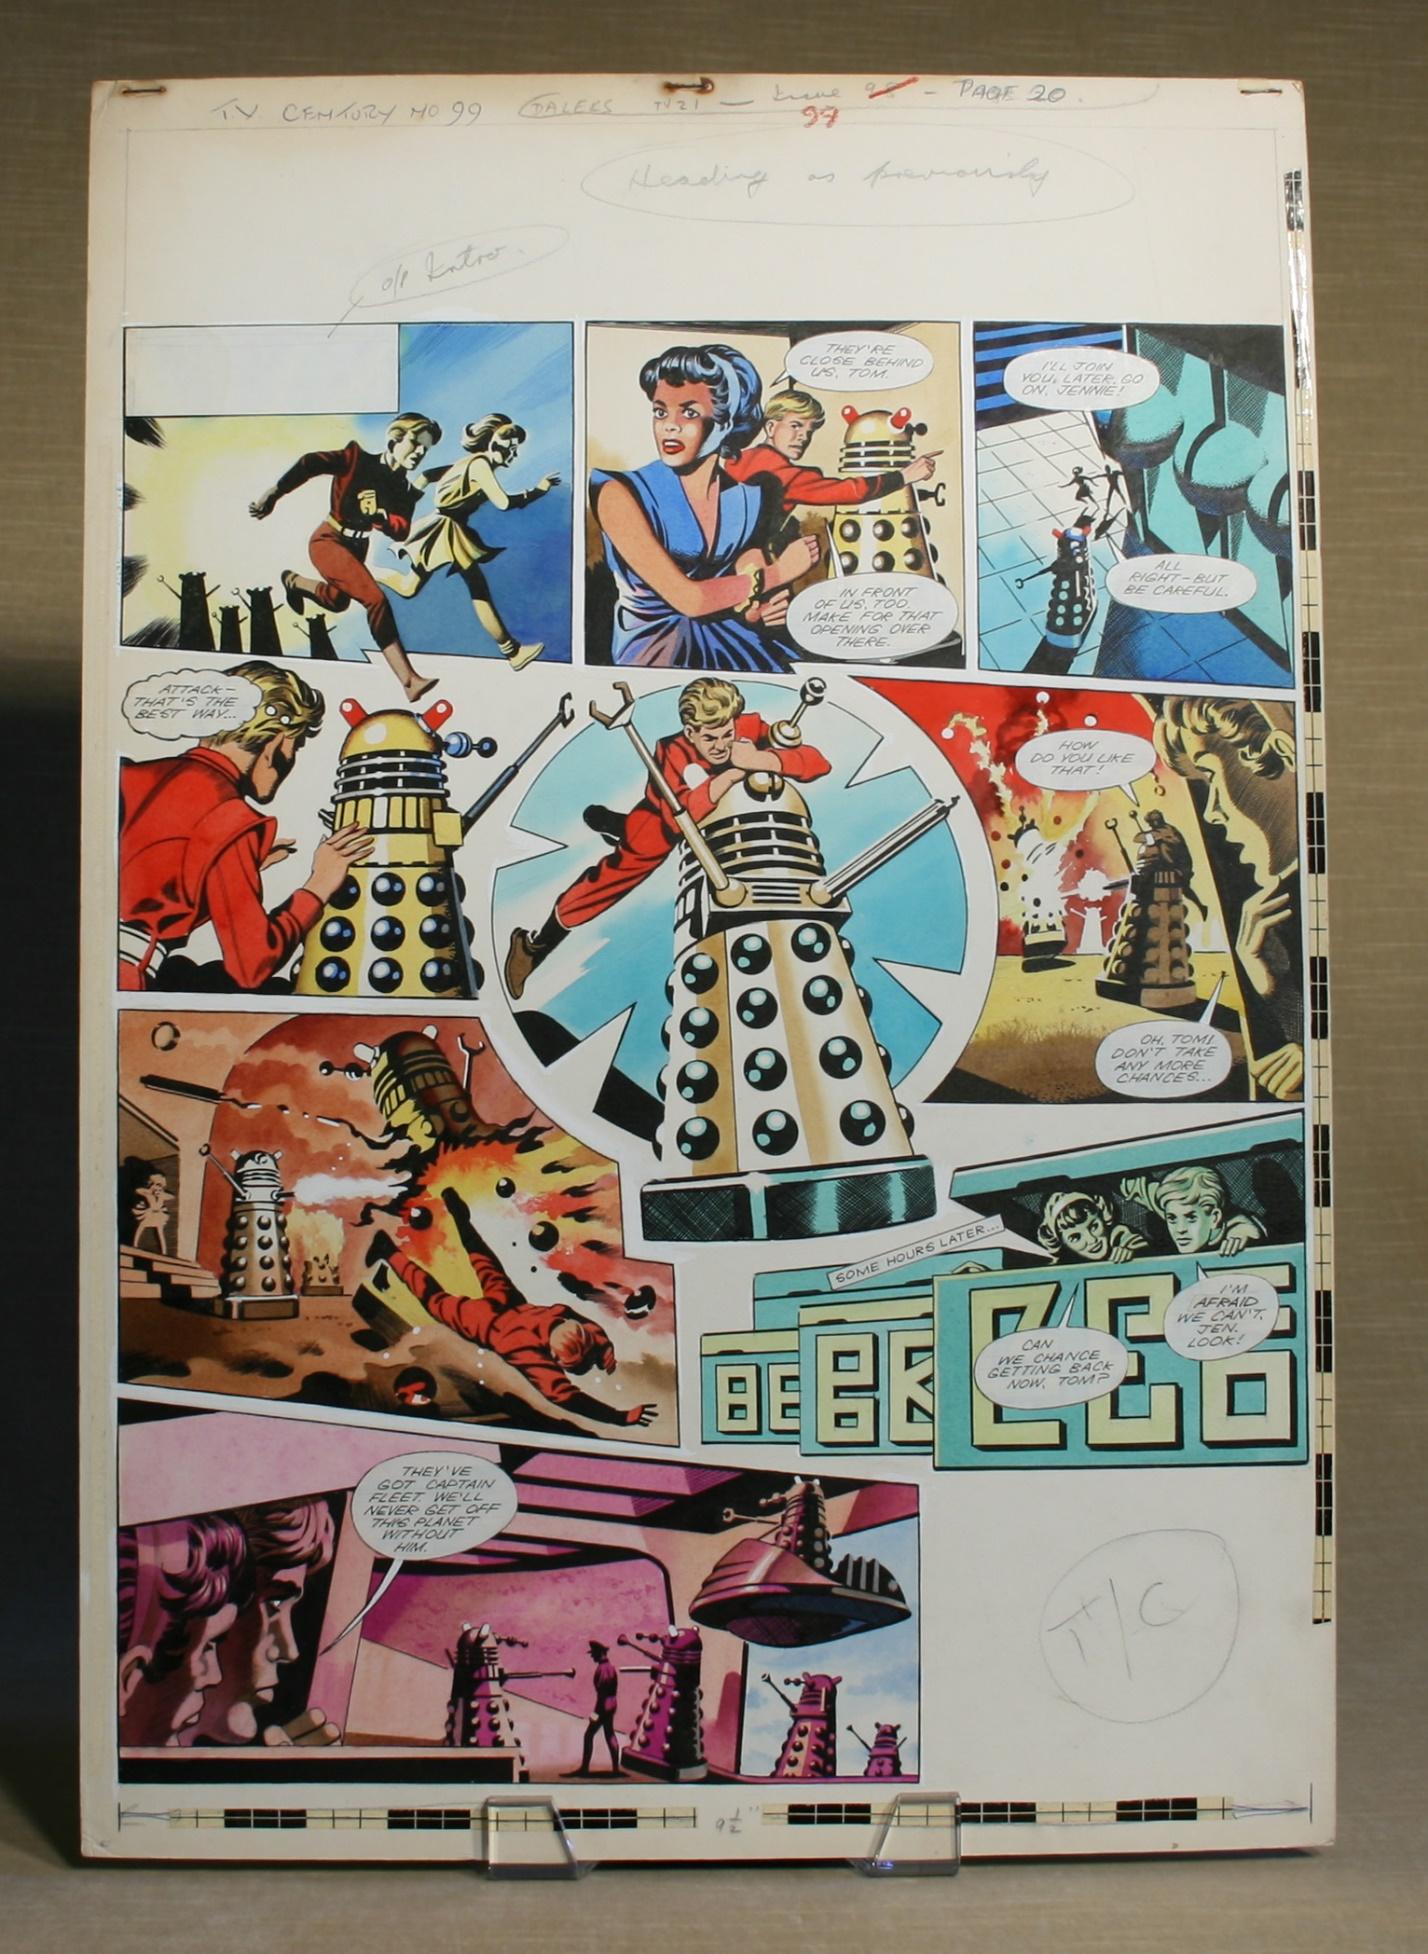 Original artwork for the Dalek strip in TV Century 21, no. 99